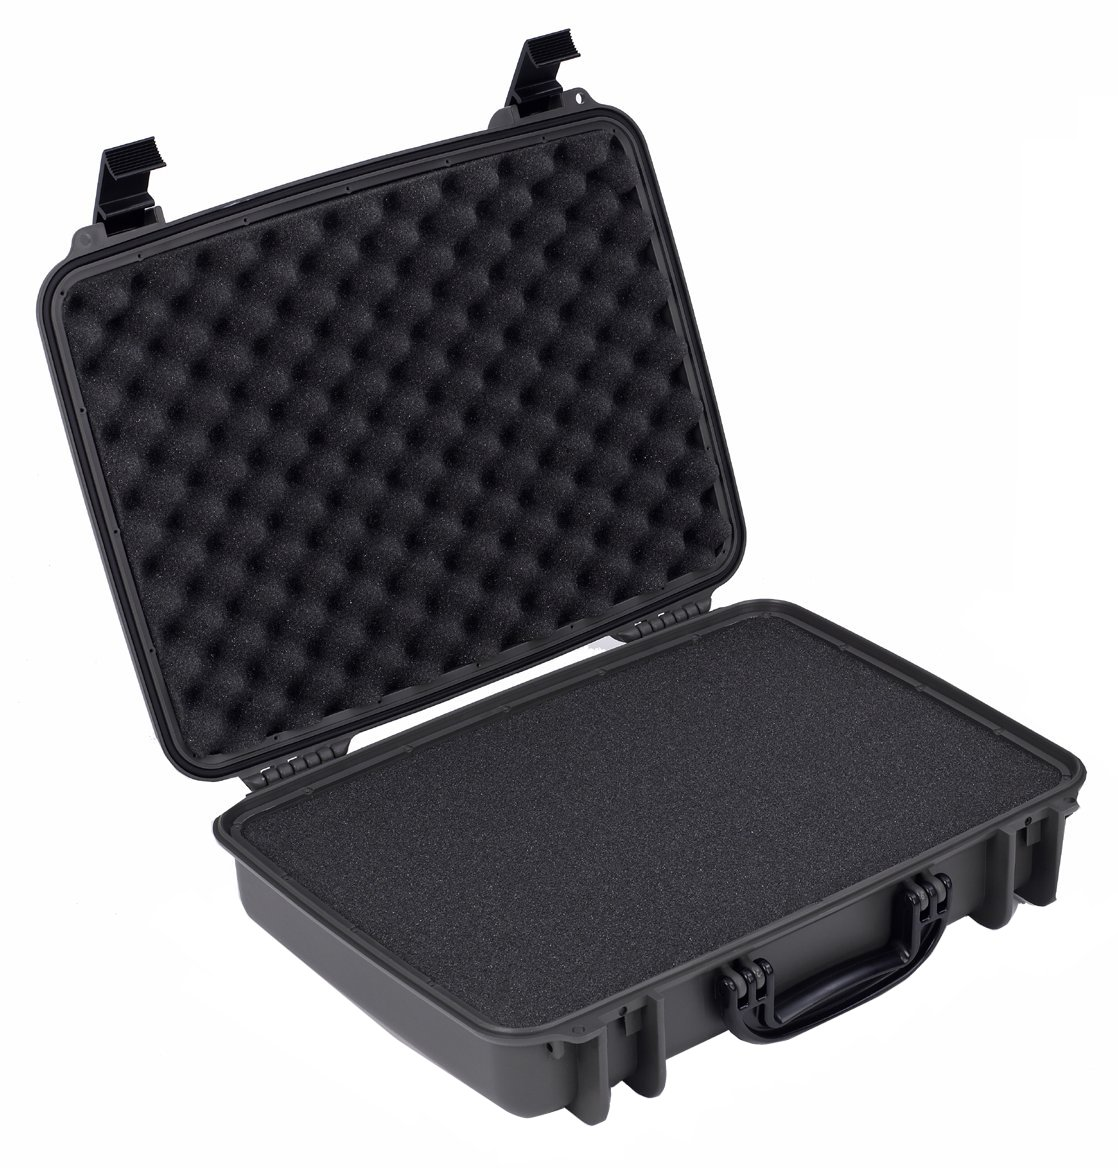 Seahorse 710 Case